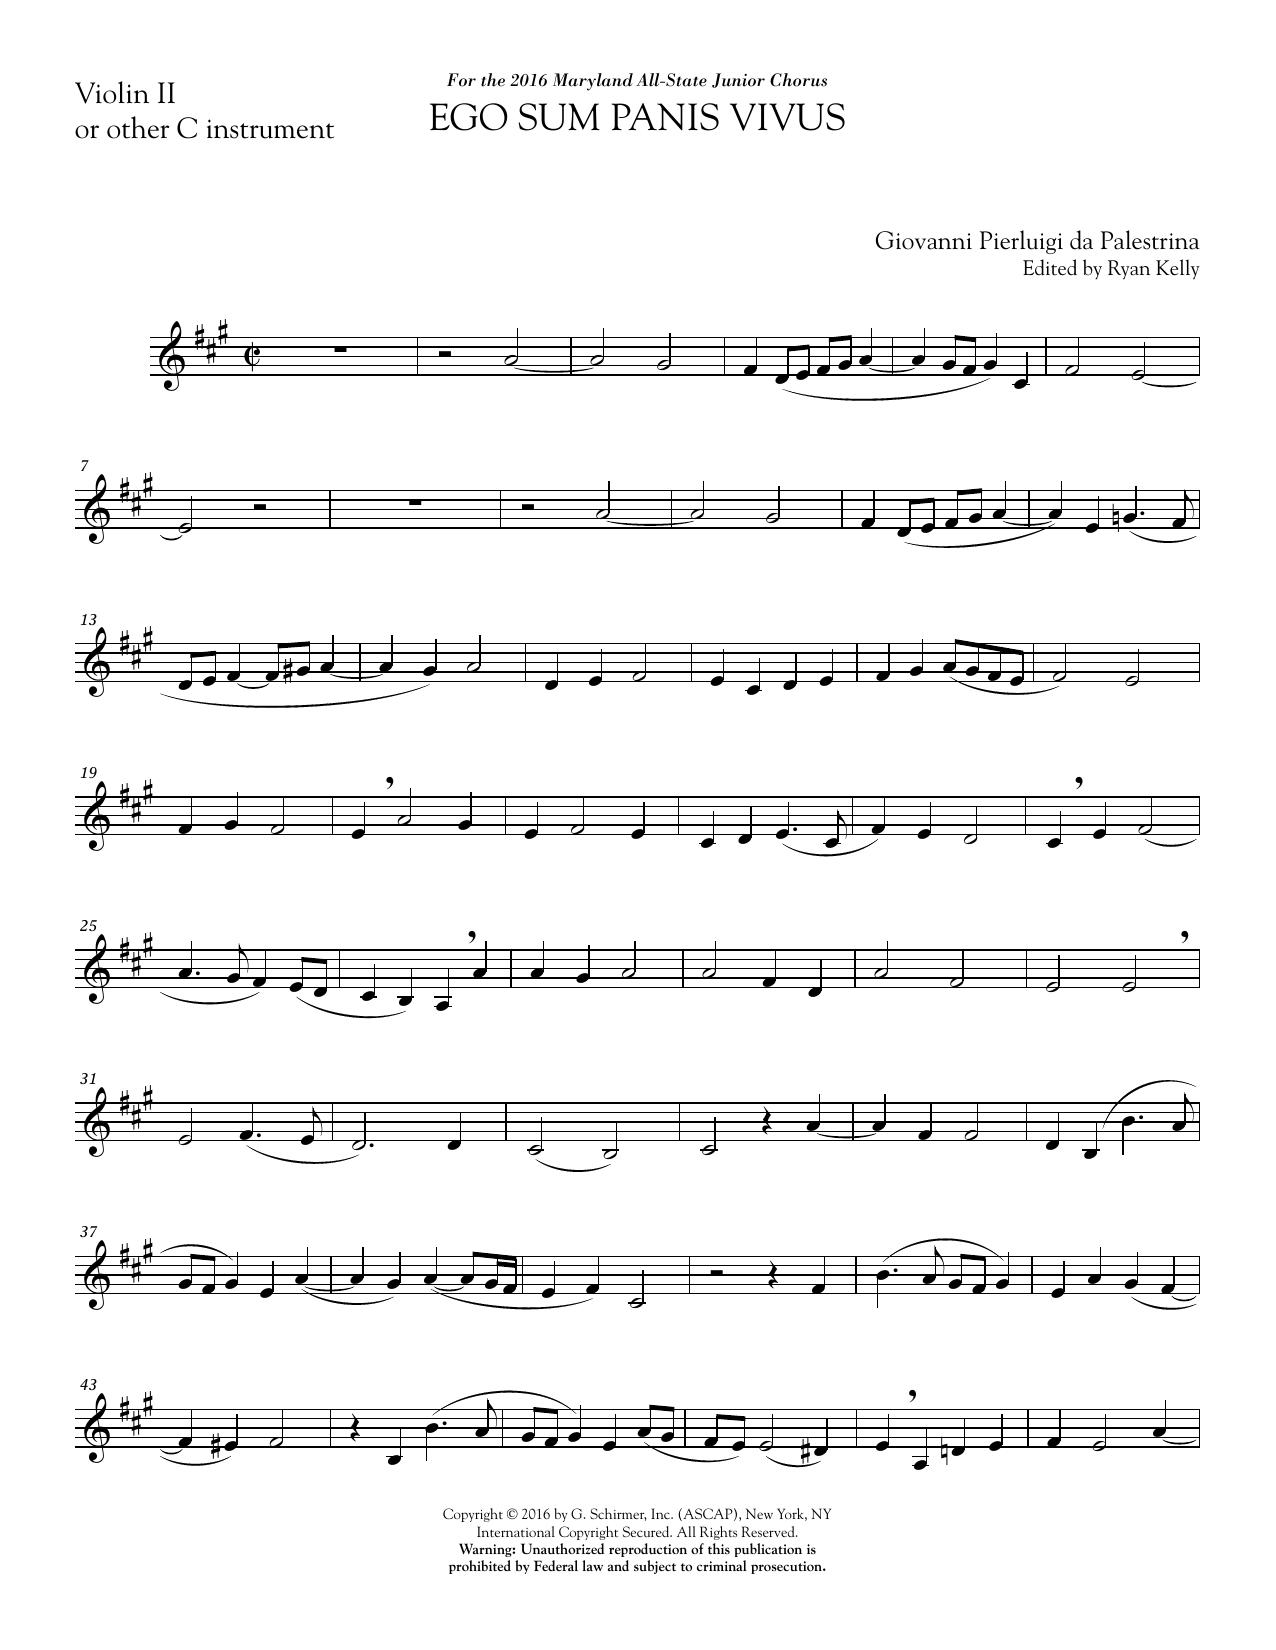 Ego sum panis vivus (ed. Ryan Kelly) - Violin 2 Sheet Music